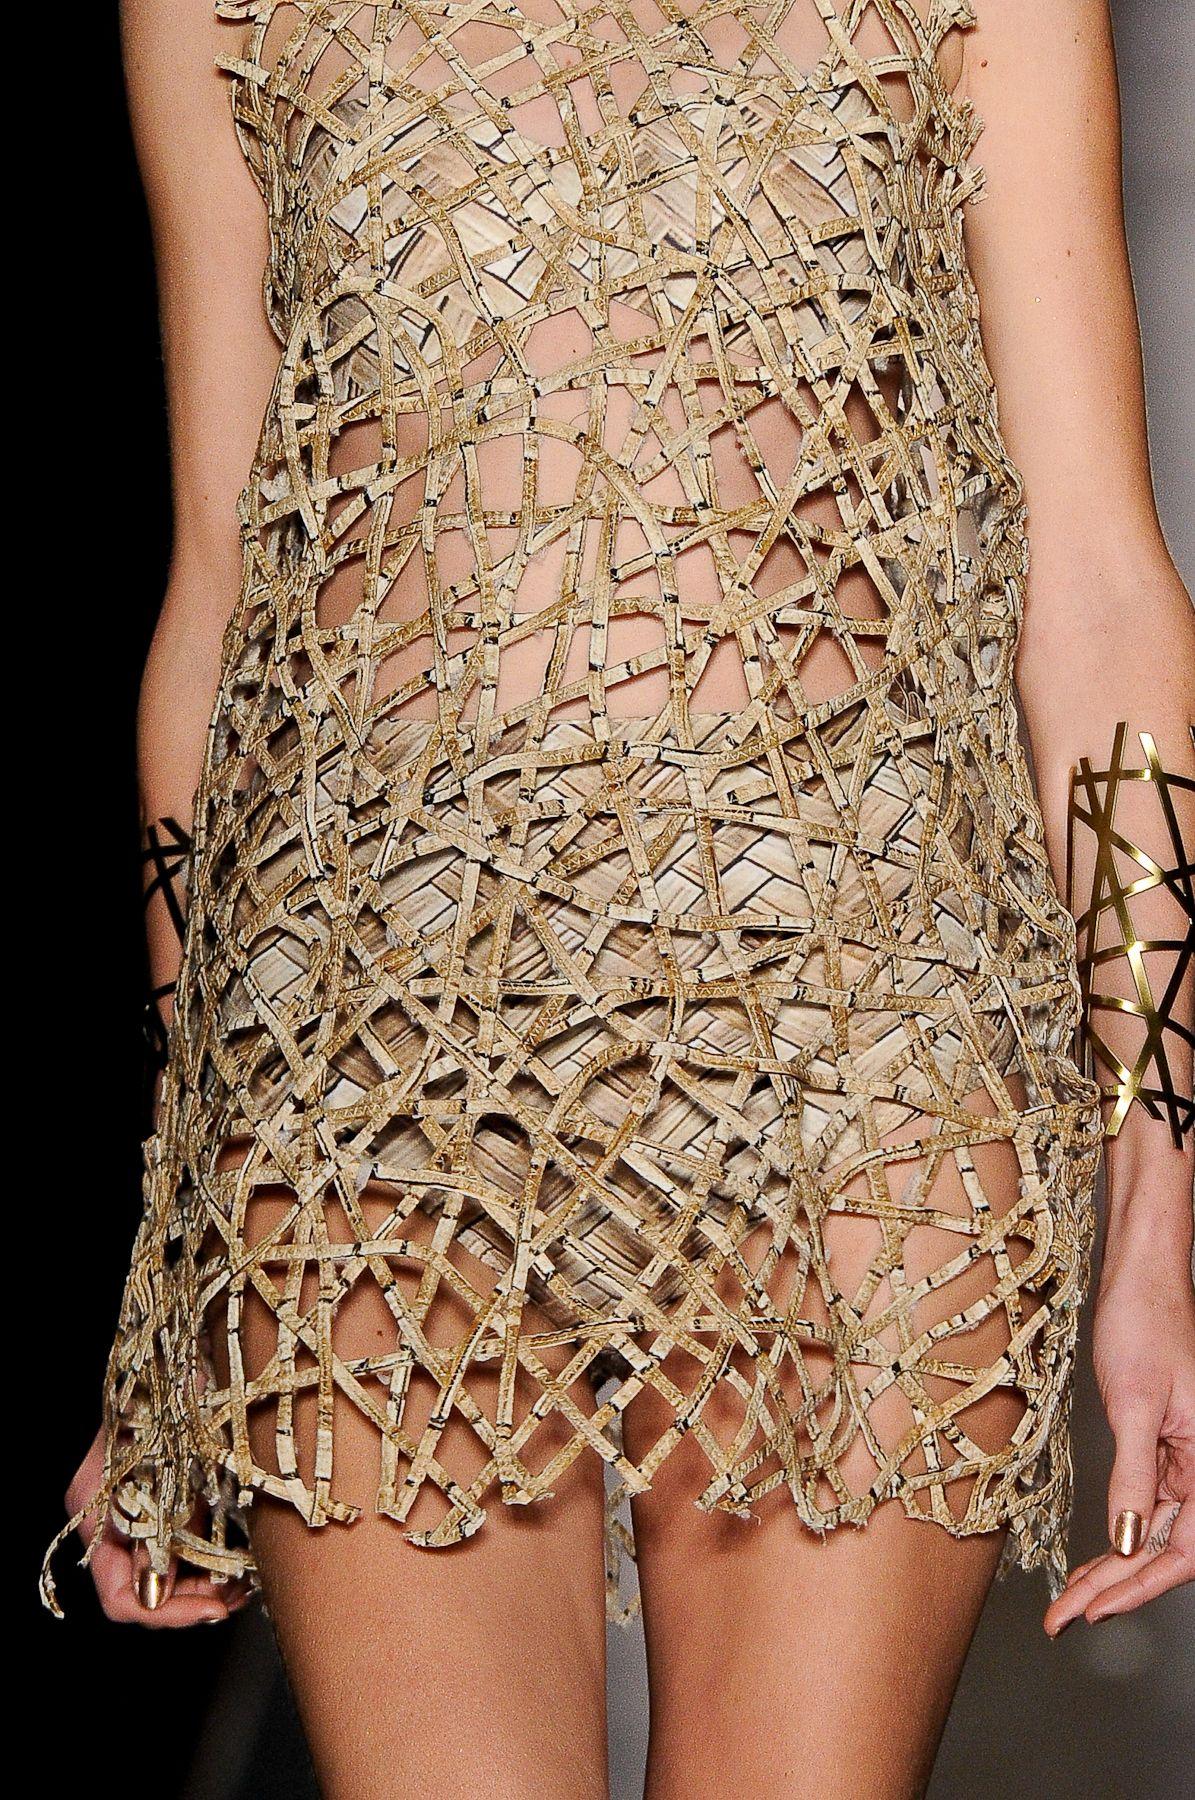 Agua de Coco por Liana Thomaz | Sao Paulo | 2014 laser cut runway dress and bikini coverup